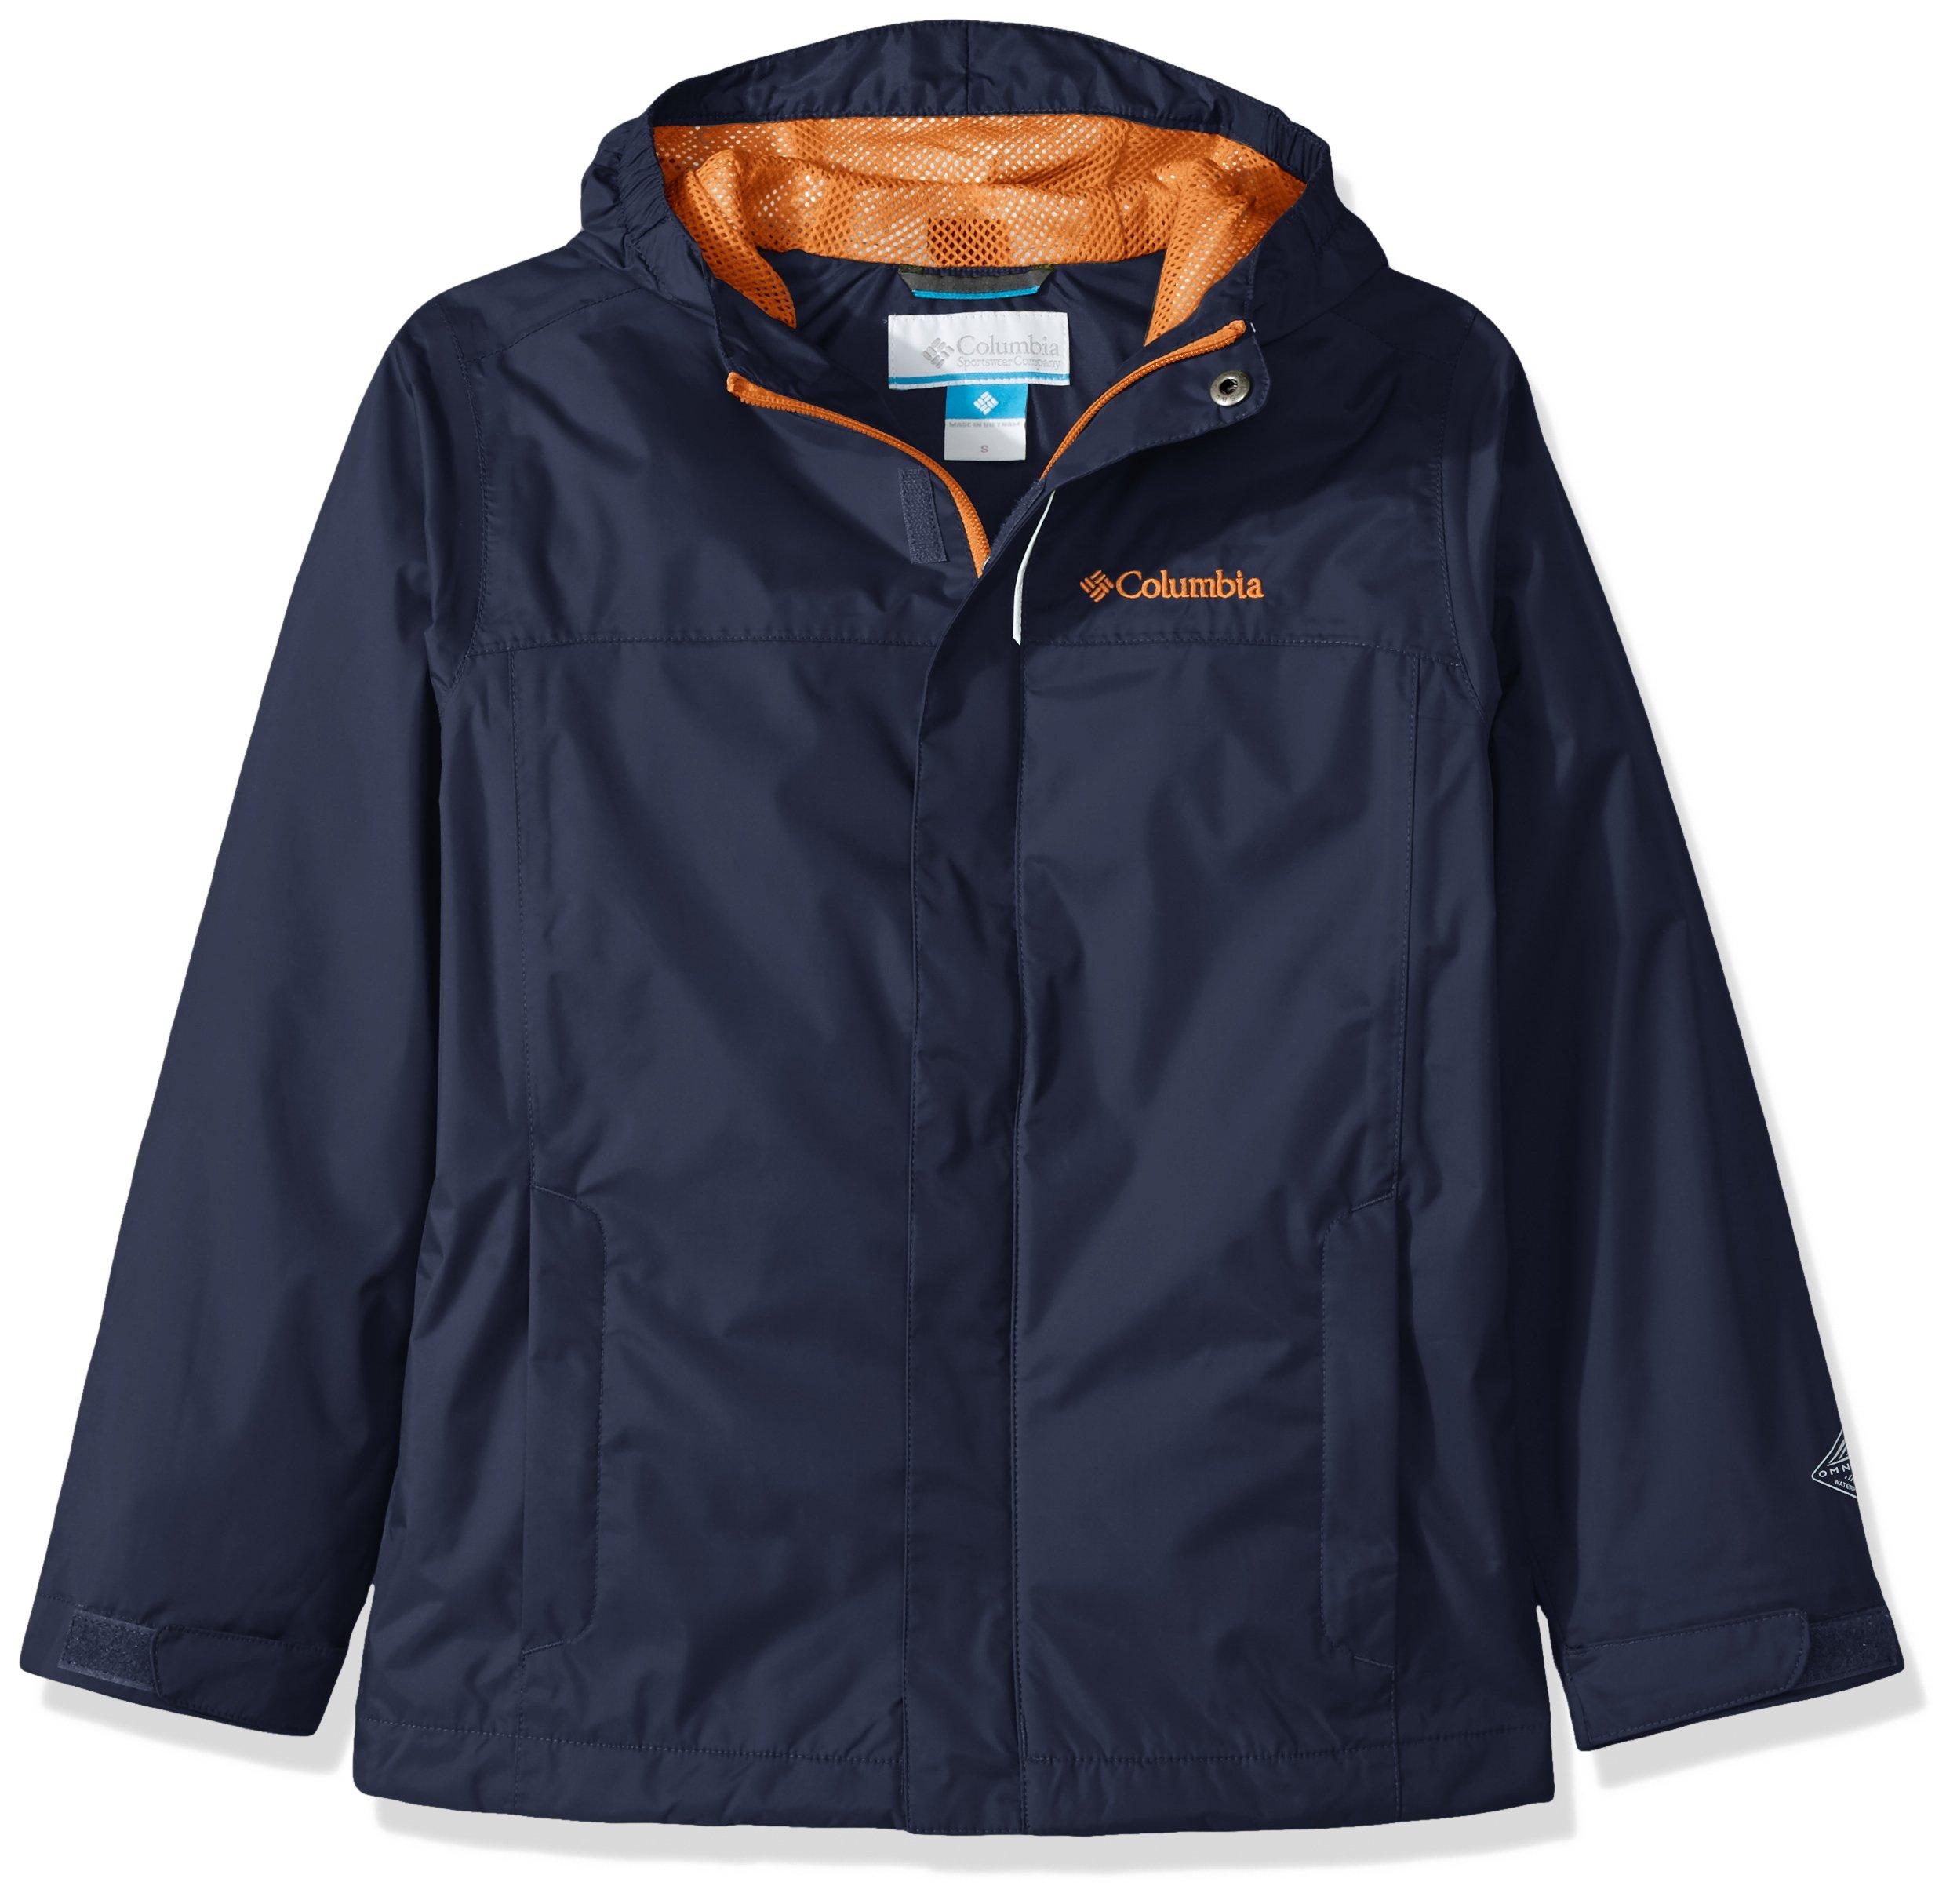 Columbia Big Boys' Watertight Jacket, Collegiate Navy, M